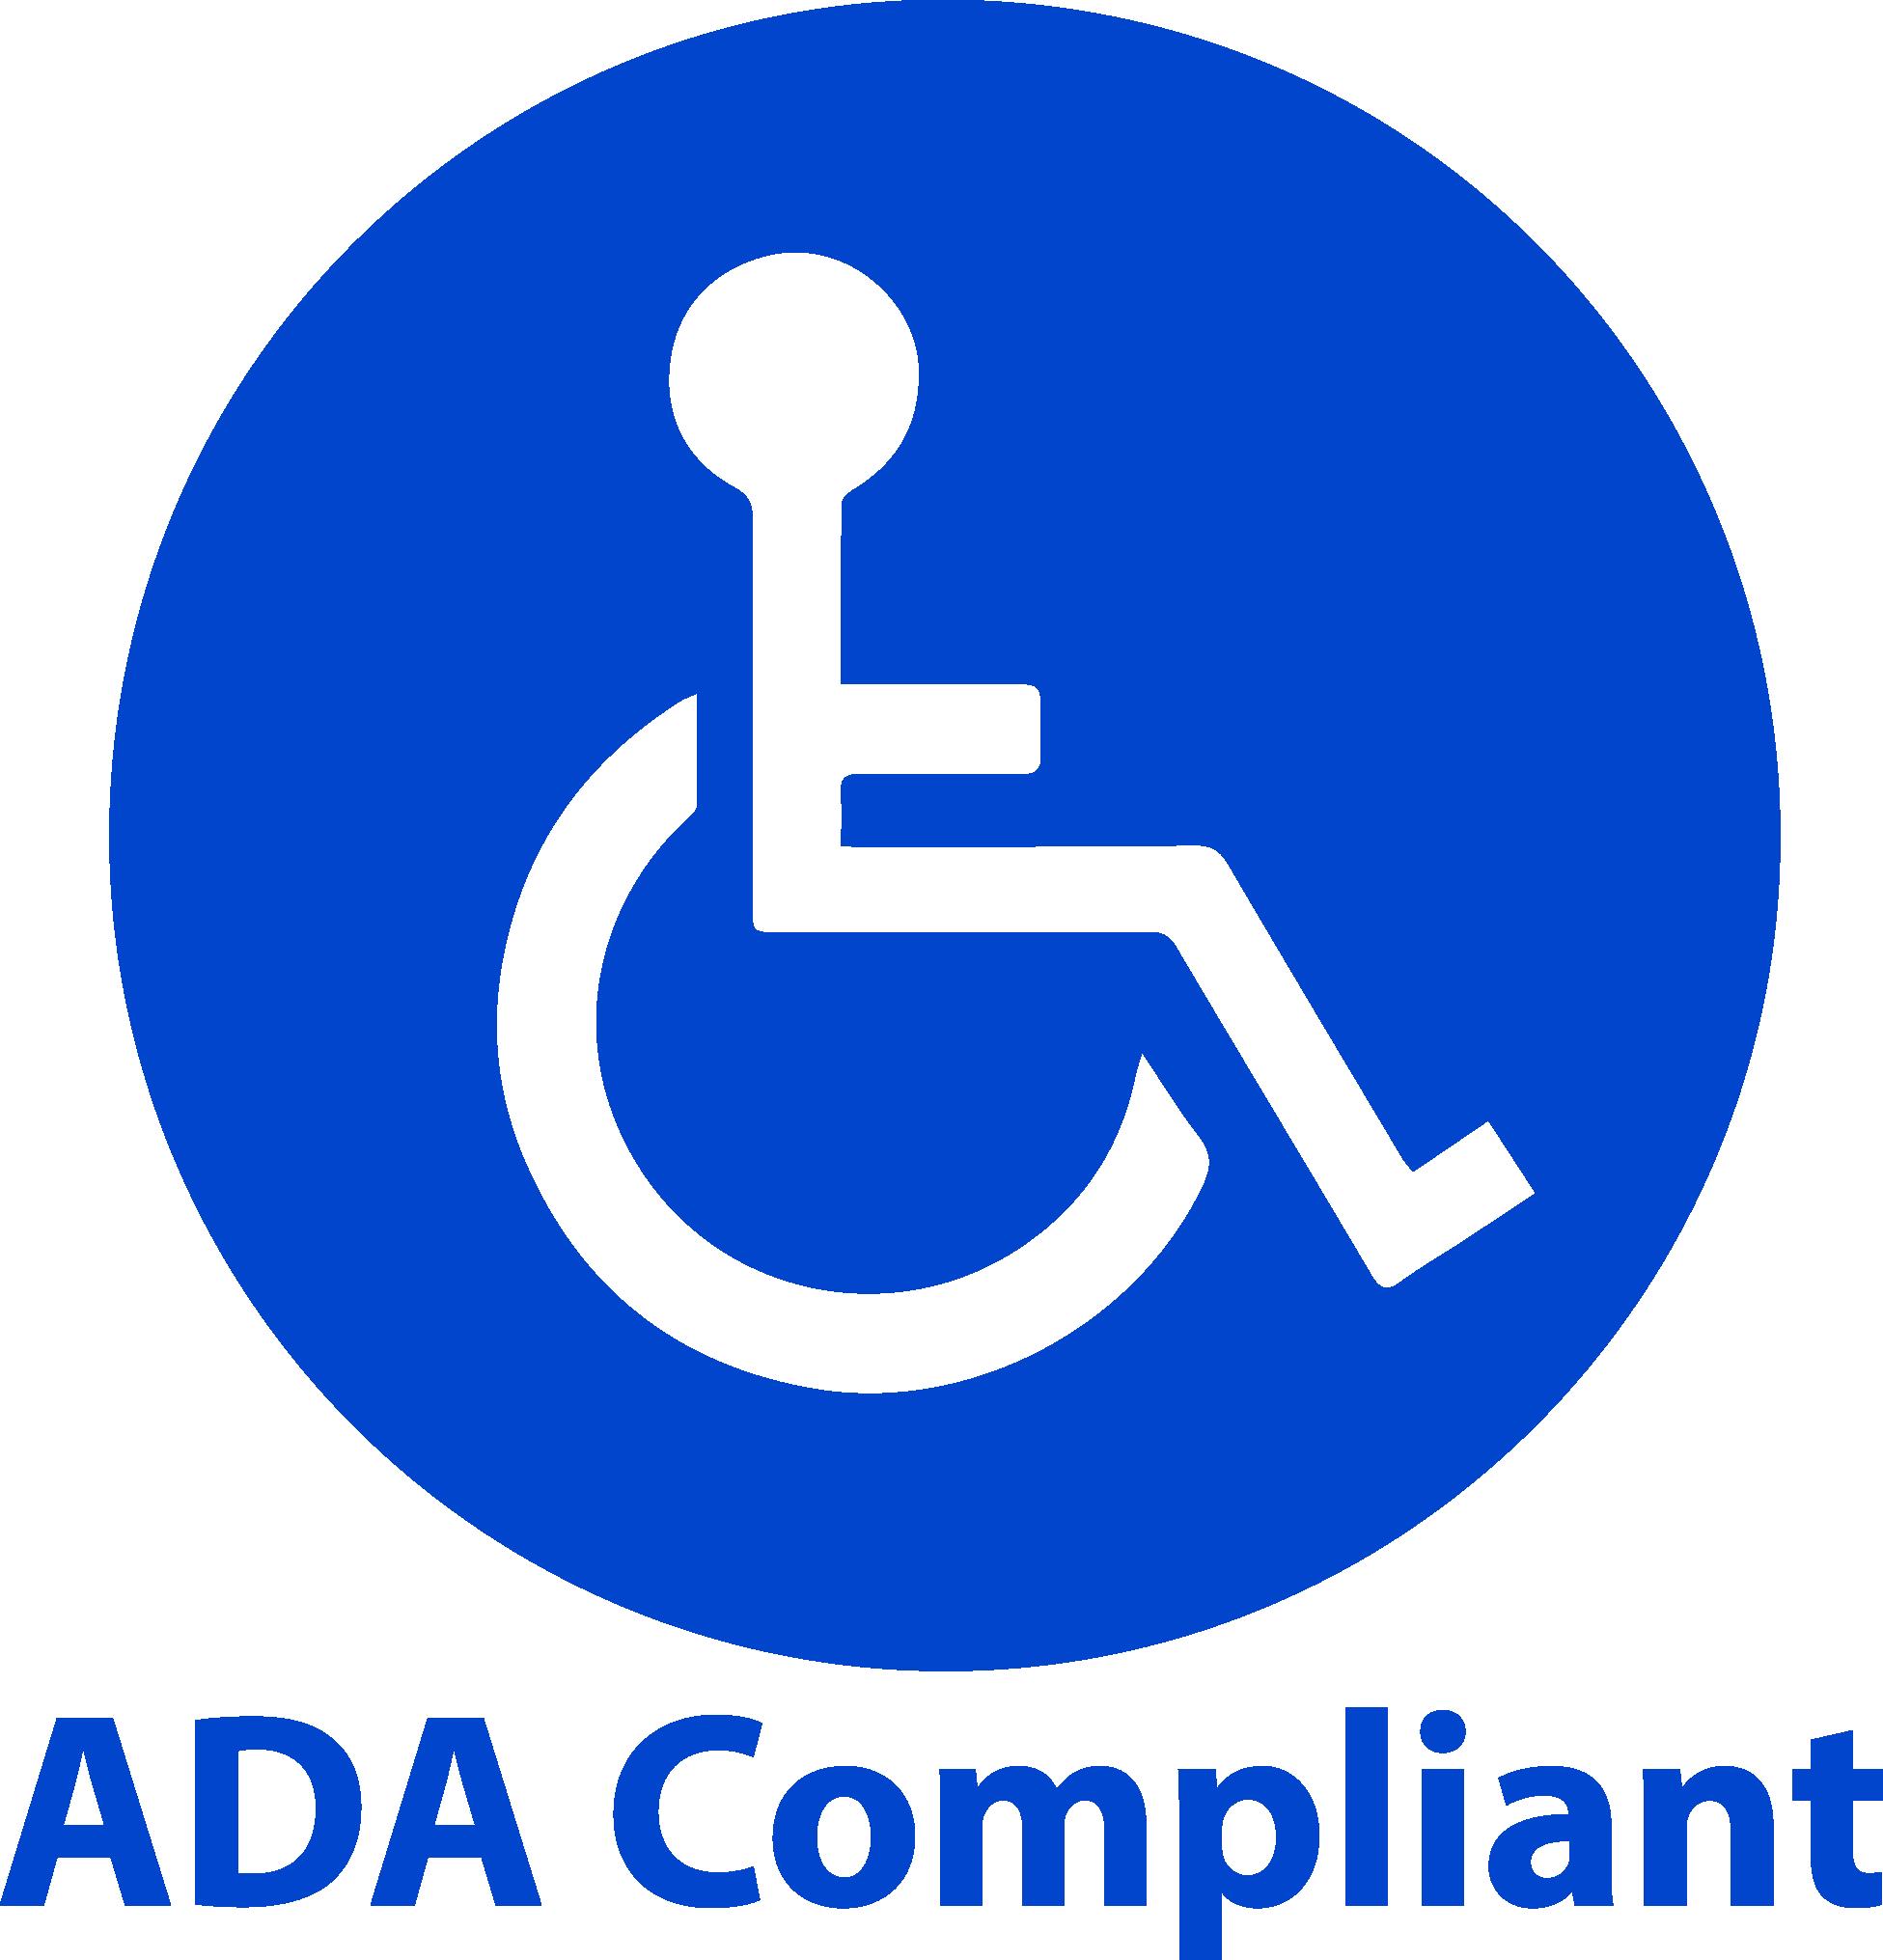 ADA Compliant Logo